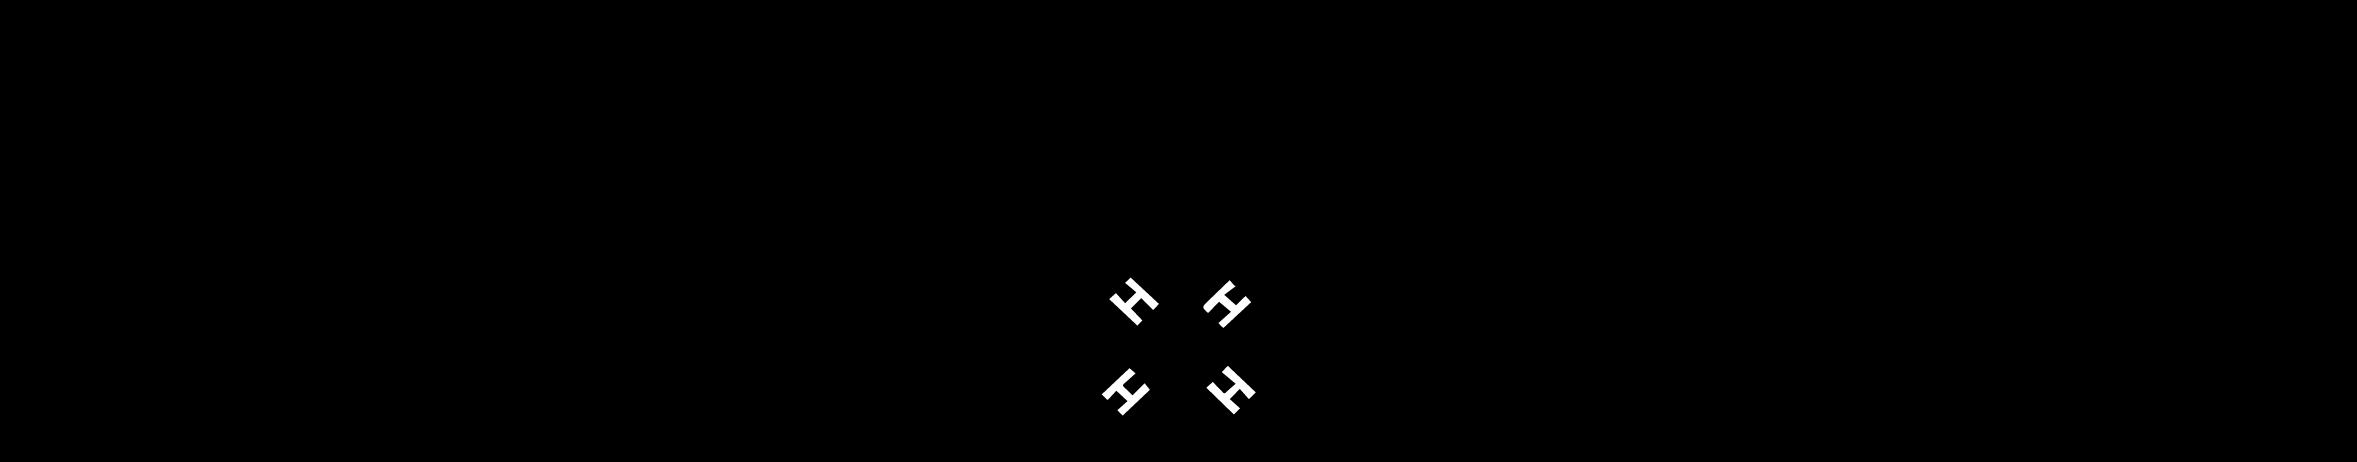 4H logo_2black.png